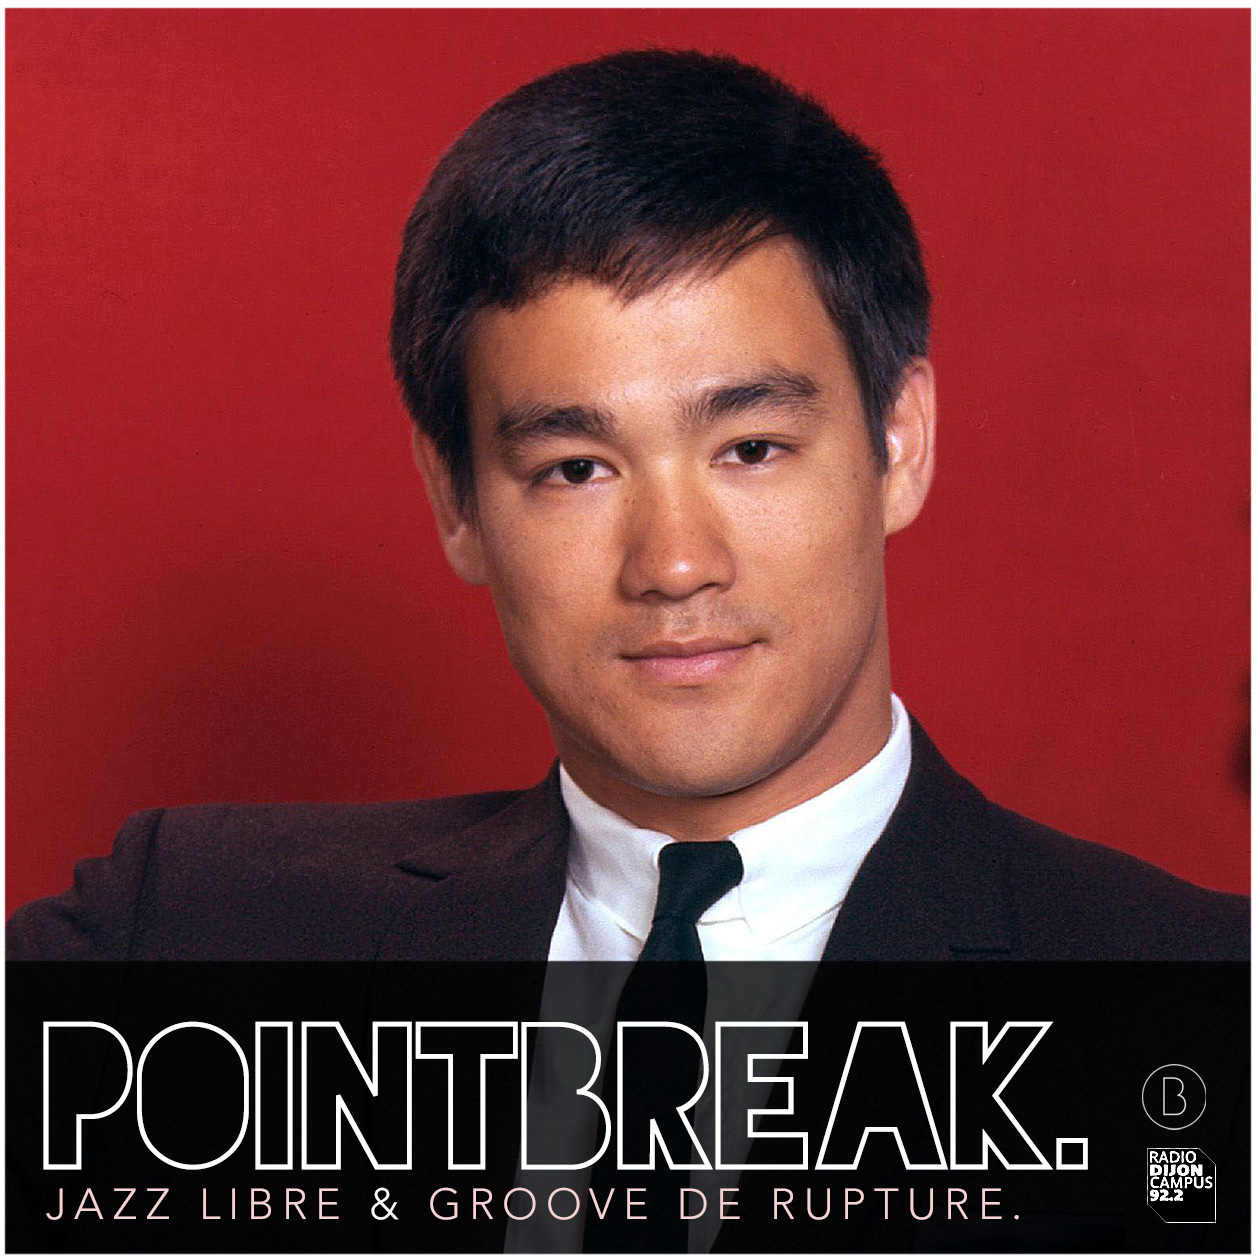 PointBreak, Radio Mix  S03 E01